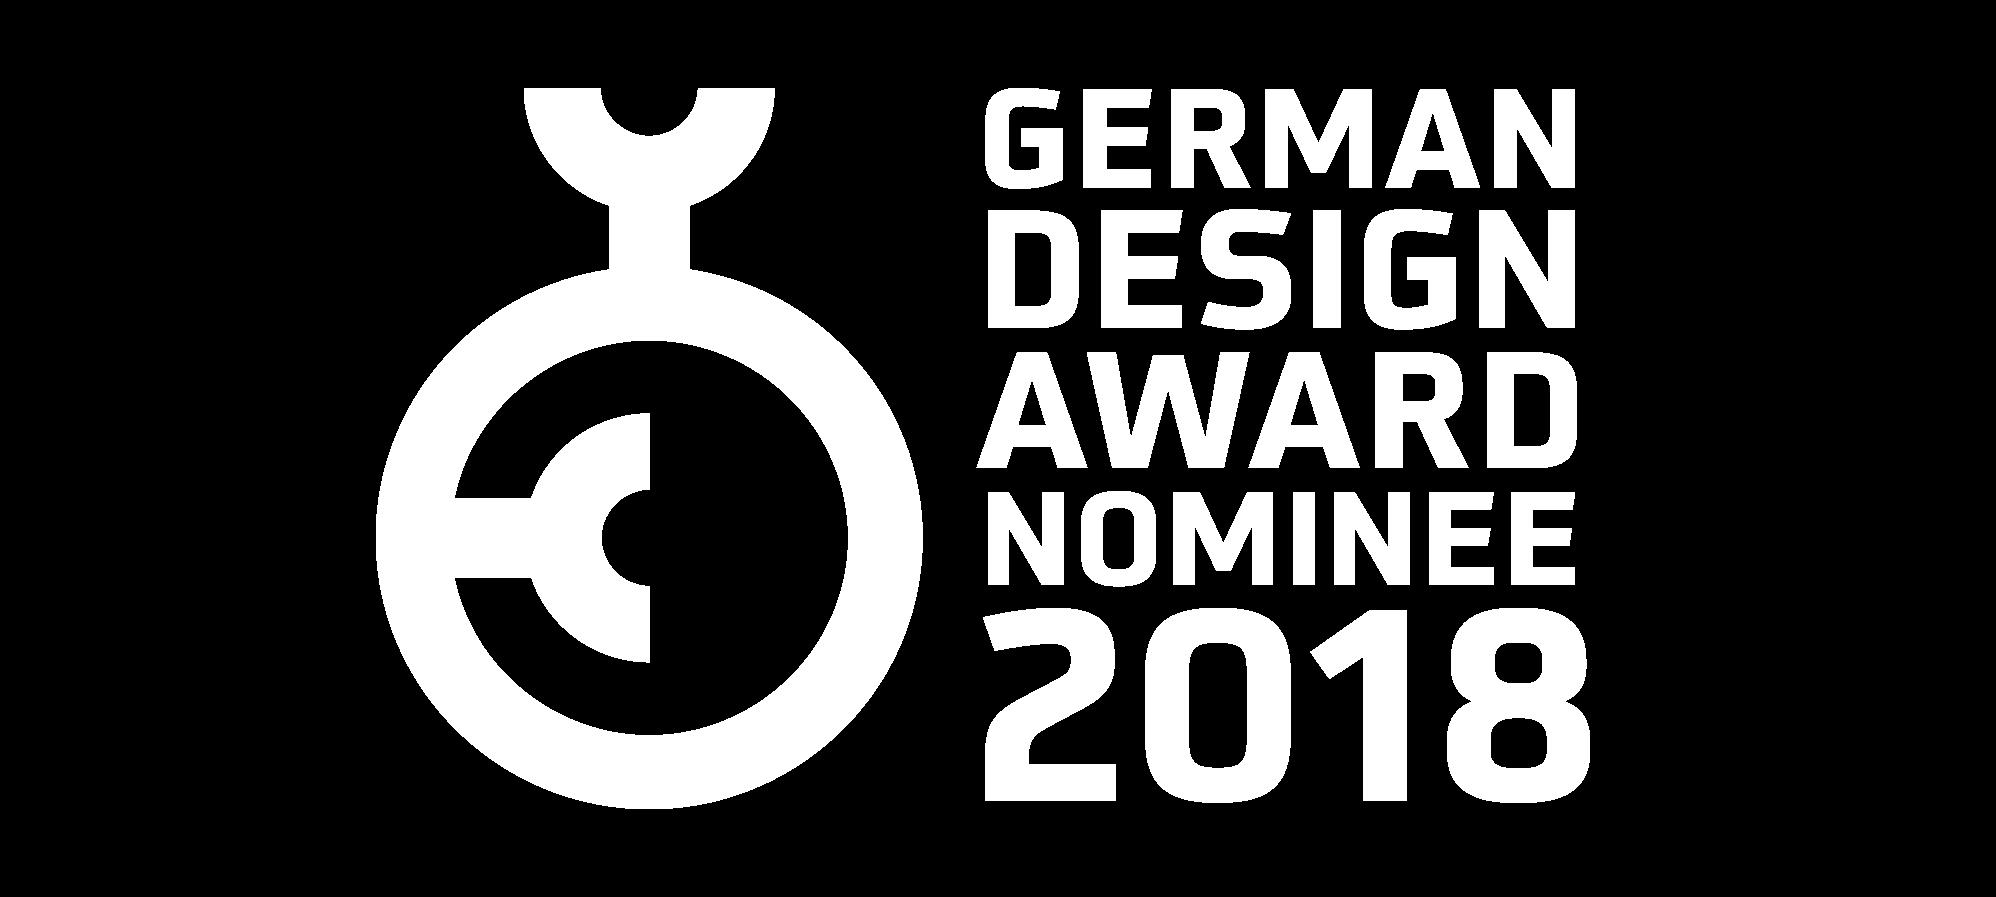 German_Design_Award_Nominee_2018_white